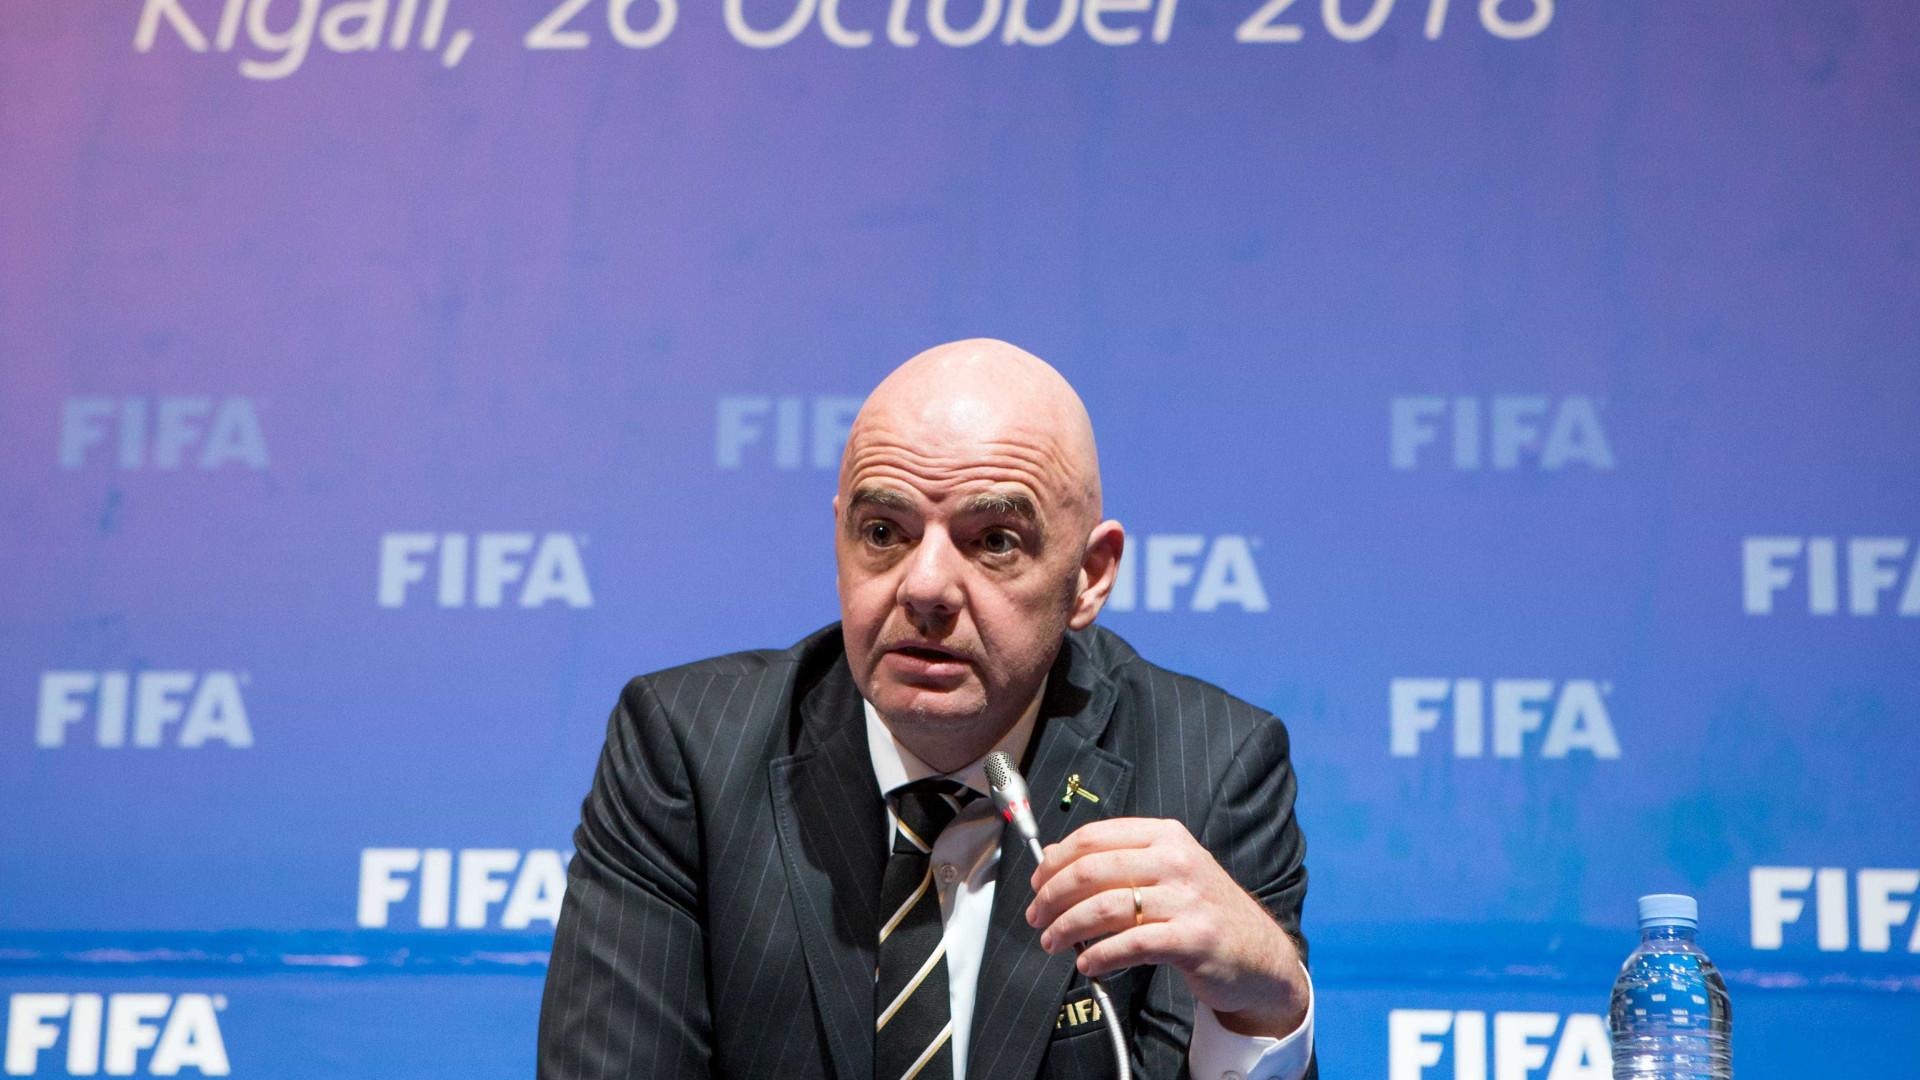 Suíça abre processo criminal contra Infantino, presidente da Fifa